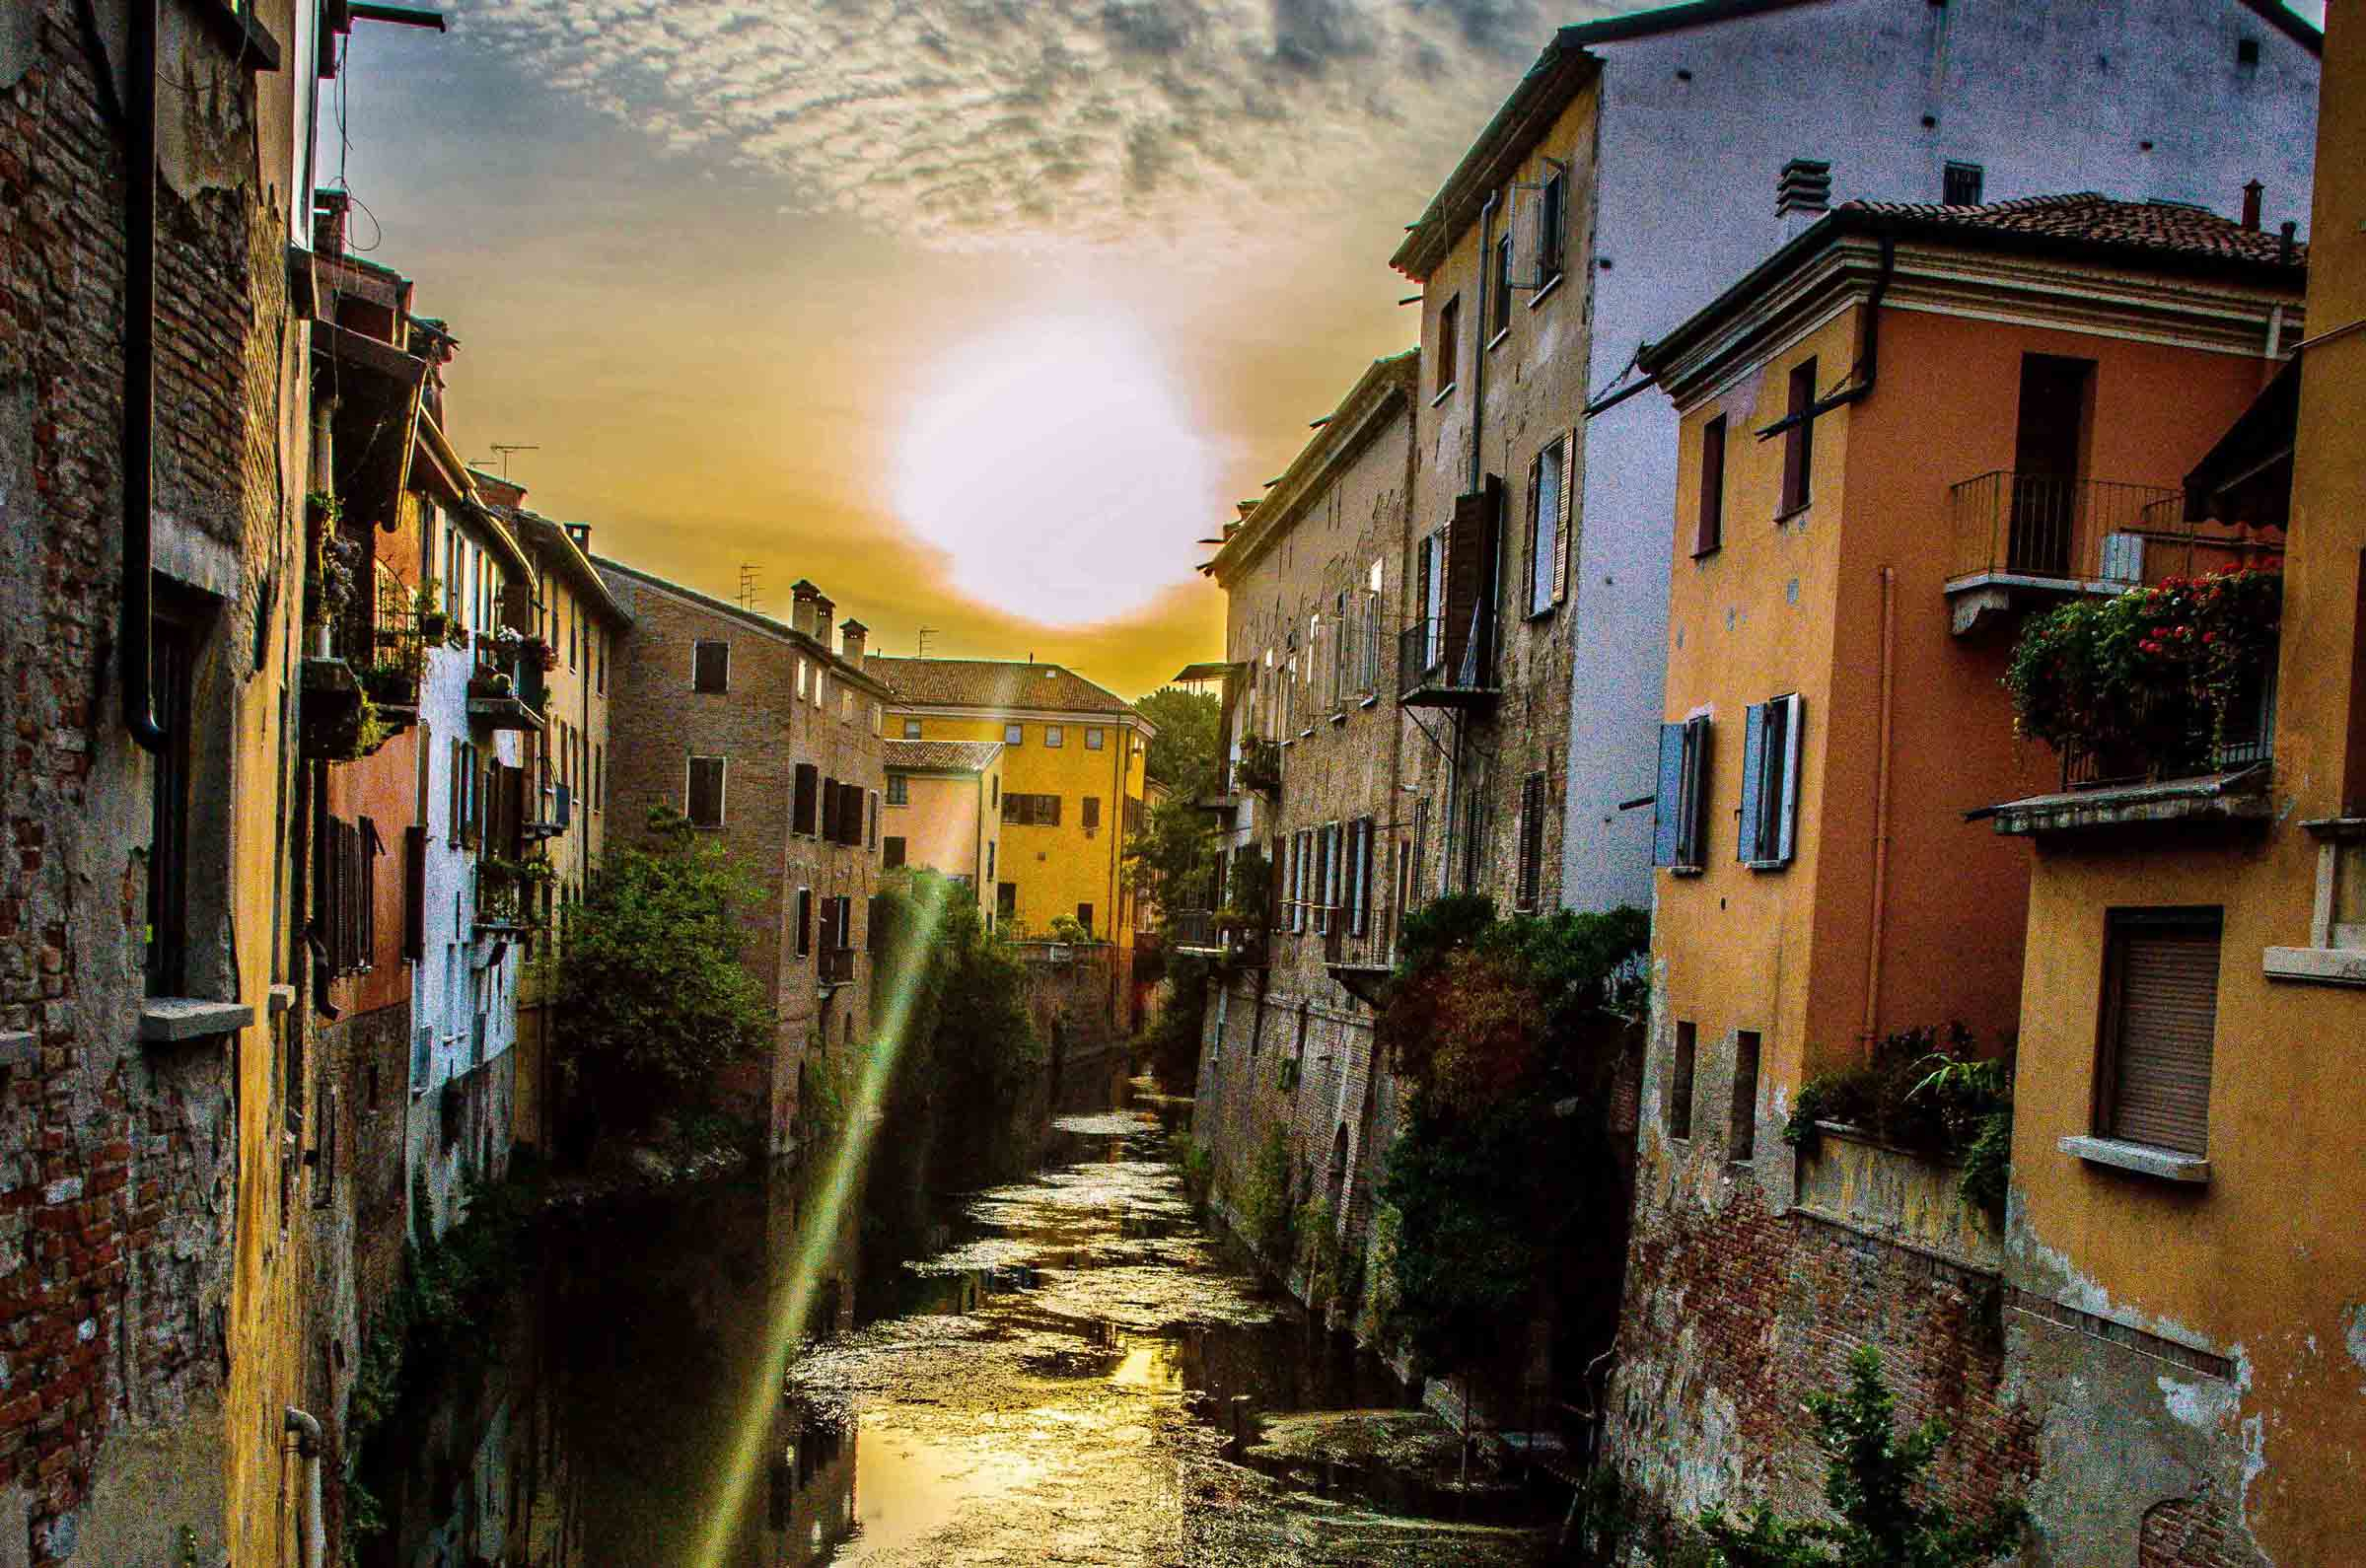 Залез в Мантуа / Sunset in Mantua